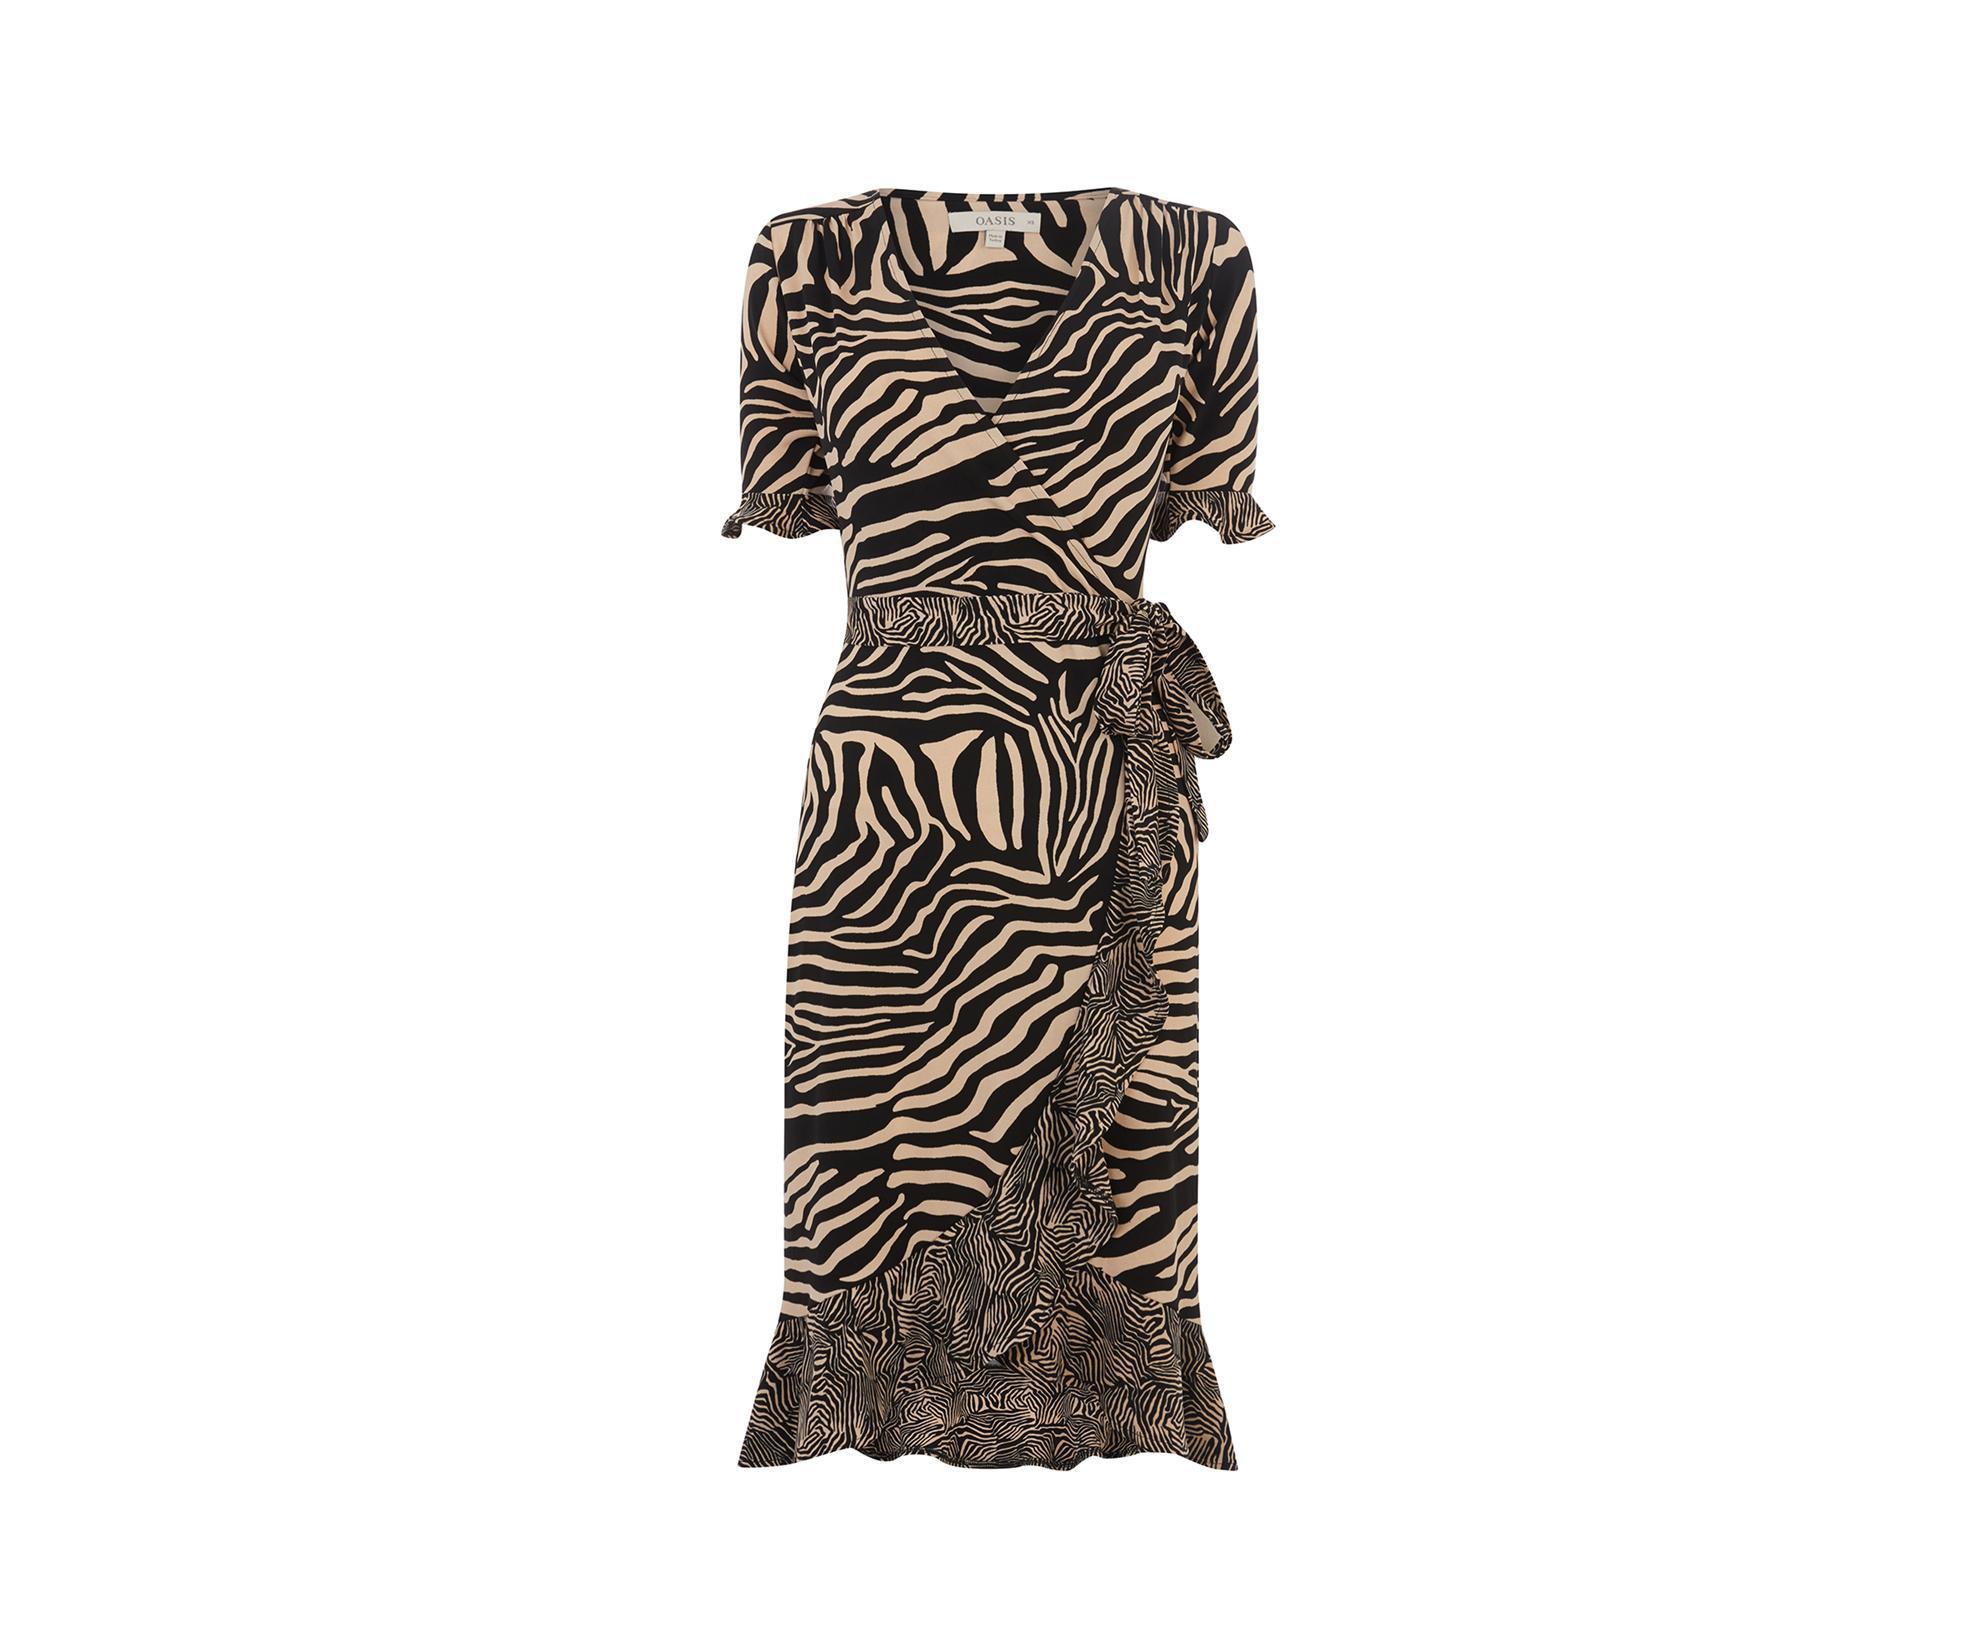 2853c7c5 ... Patched Wrap Dress - Lyst. Visit Oasis. Tap to visit site